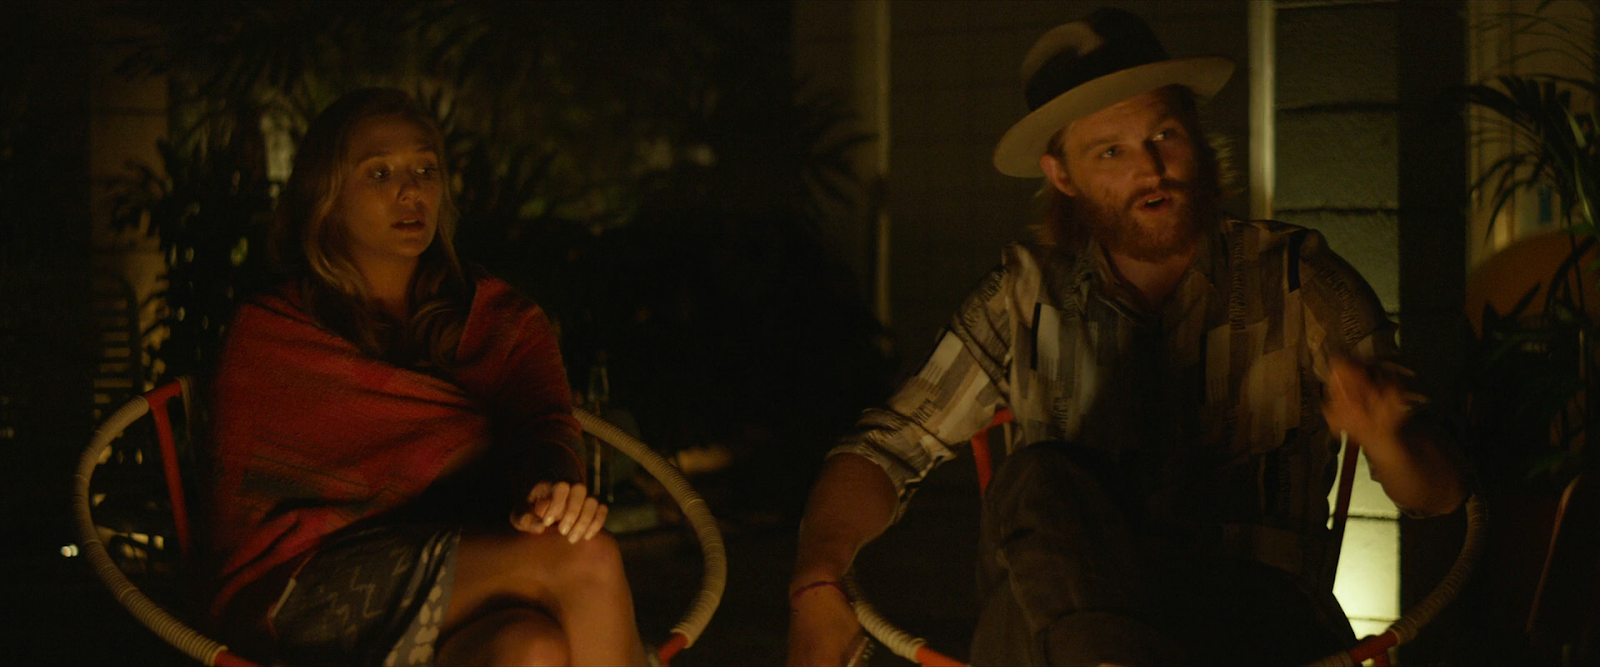 Ingrid Goes West (2017) BRRip 1080p Latino-Castellano-Ingles captura 4